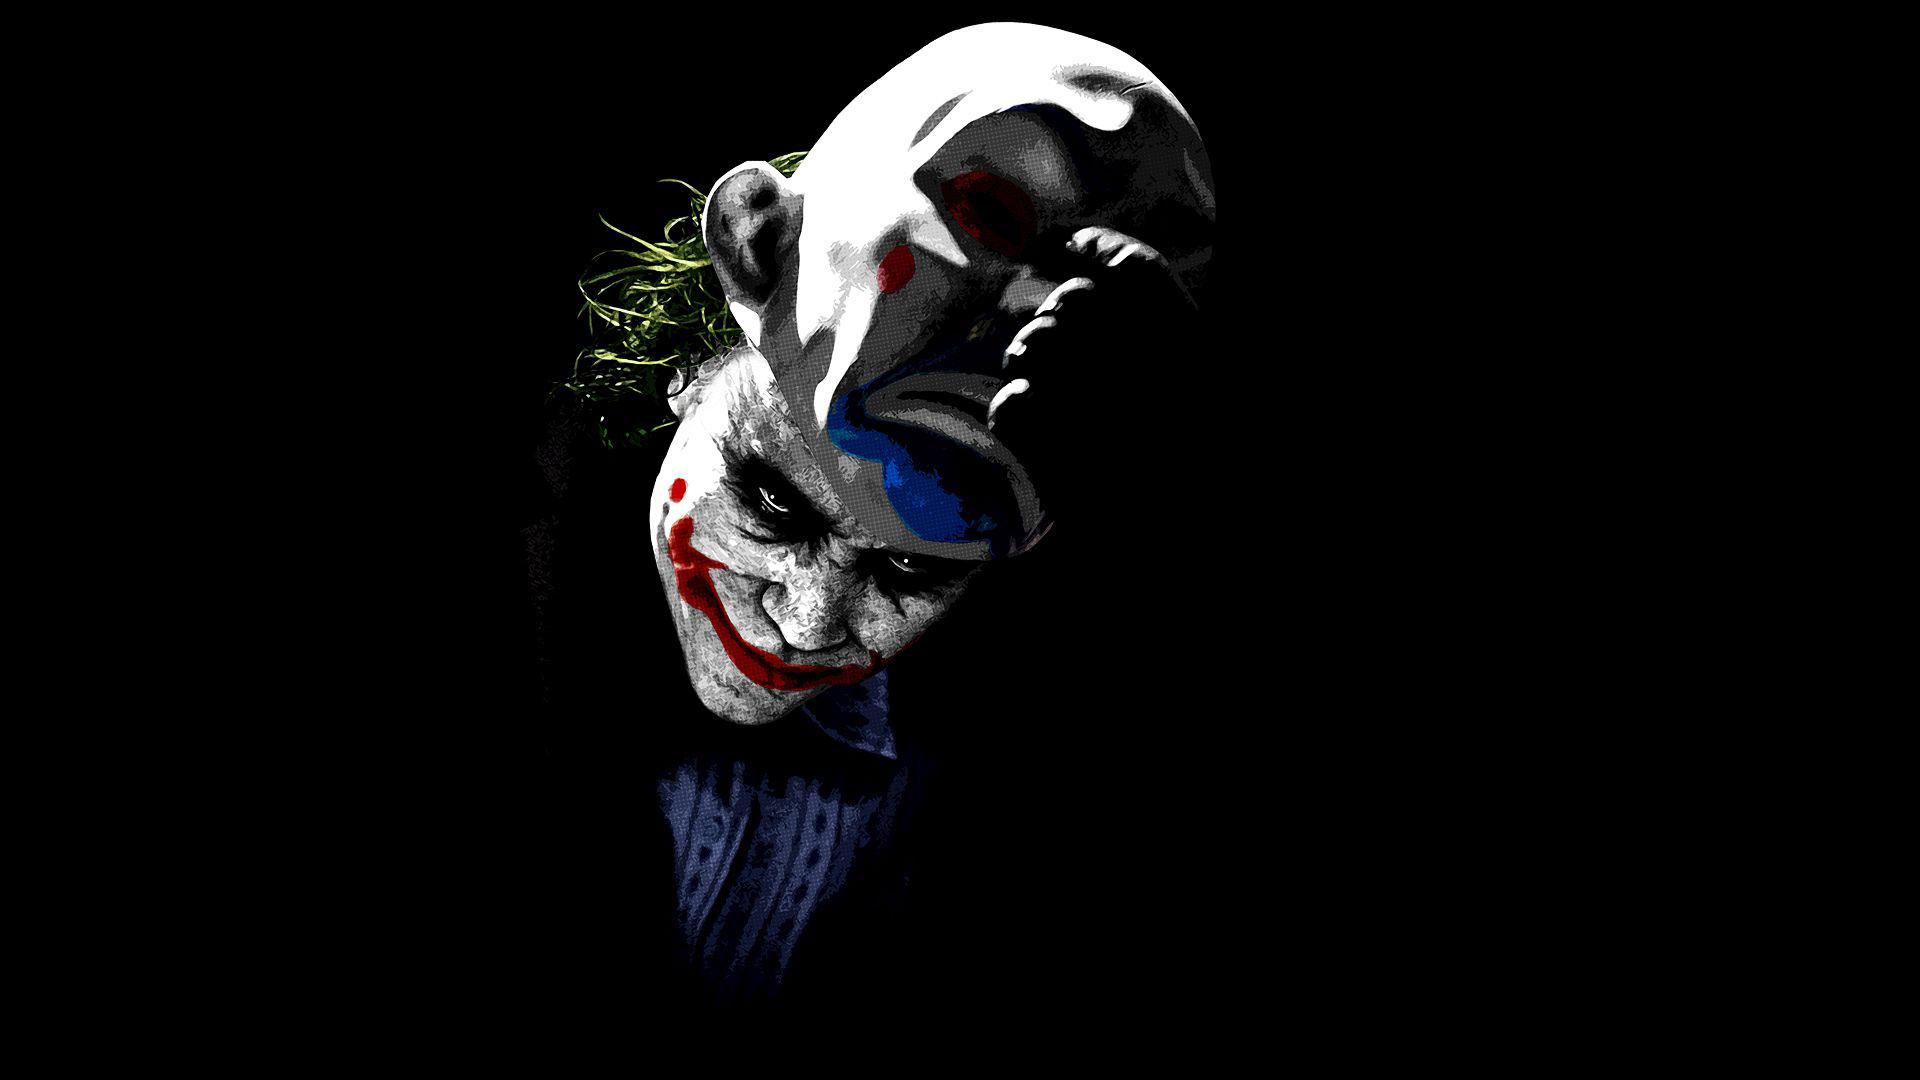 The Joker   The Dark Knight wallpaper 20431 1920x1080